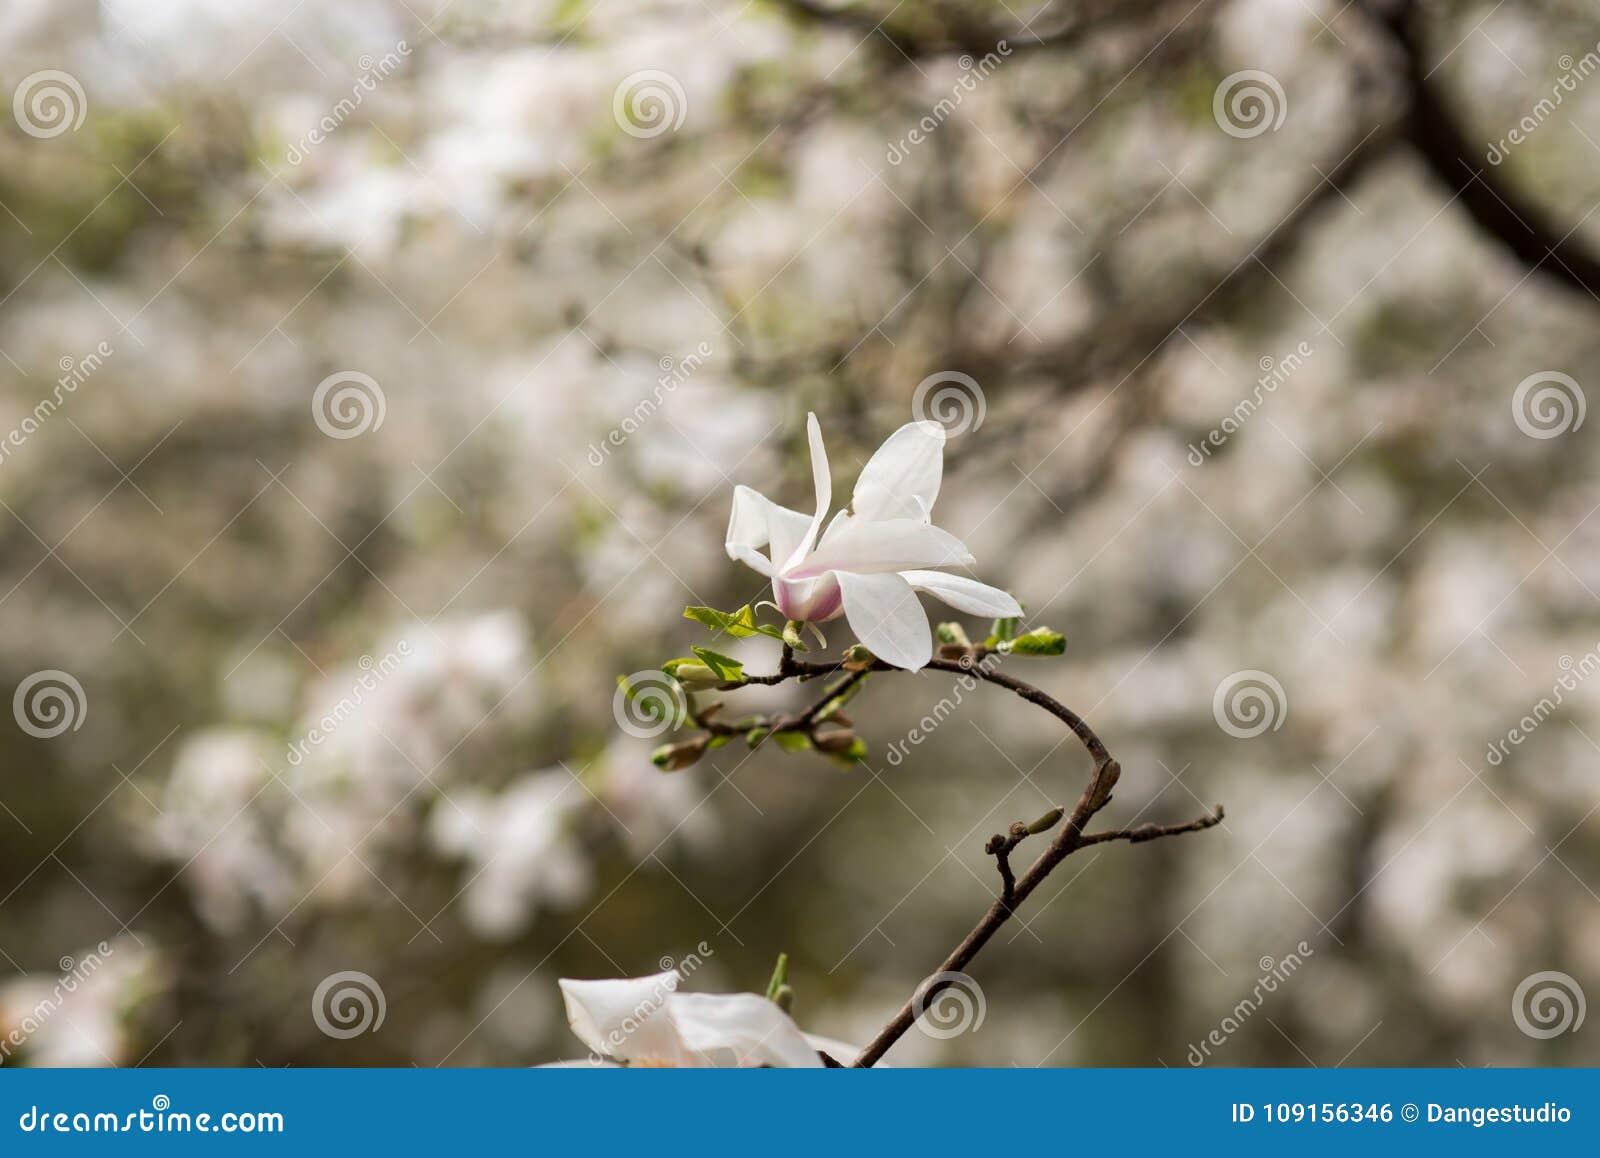 Amazing White Magnolia Flowers In The Spring Season Stock Photo